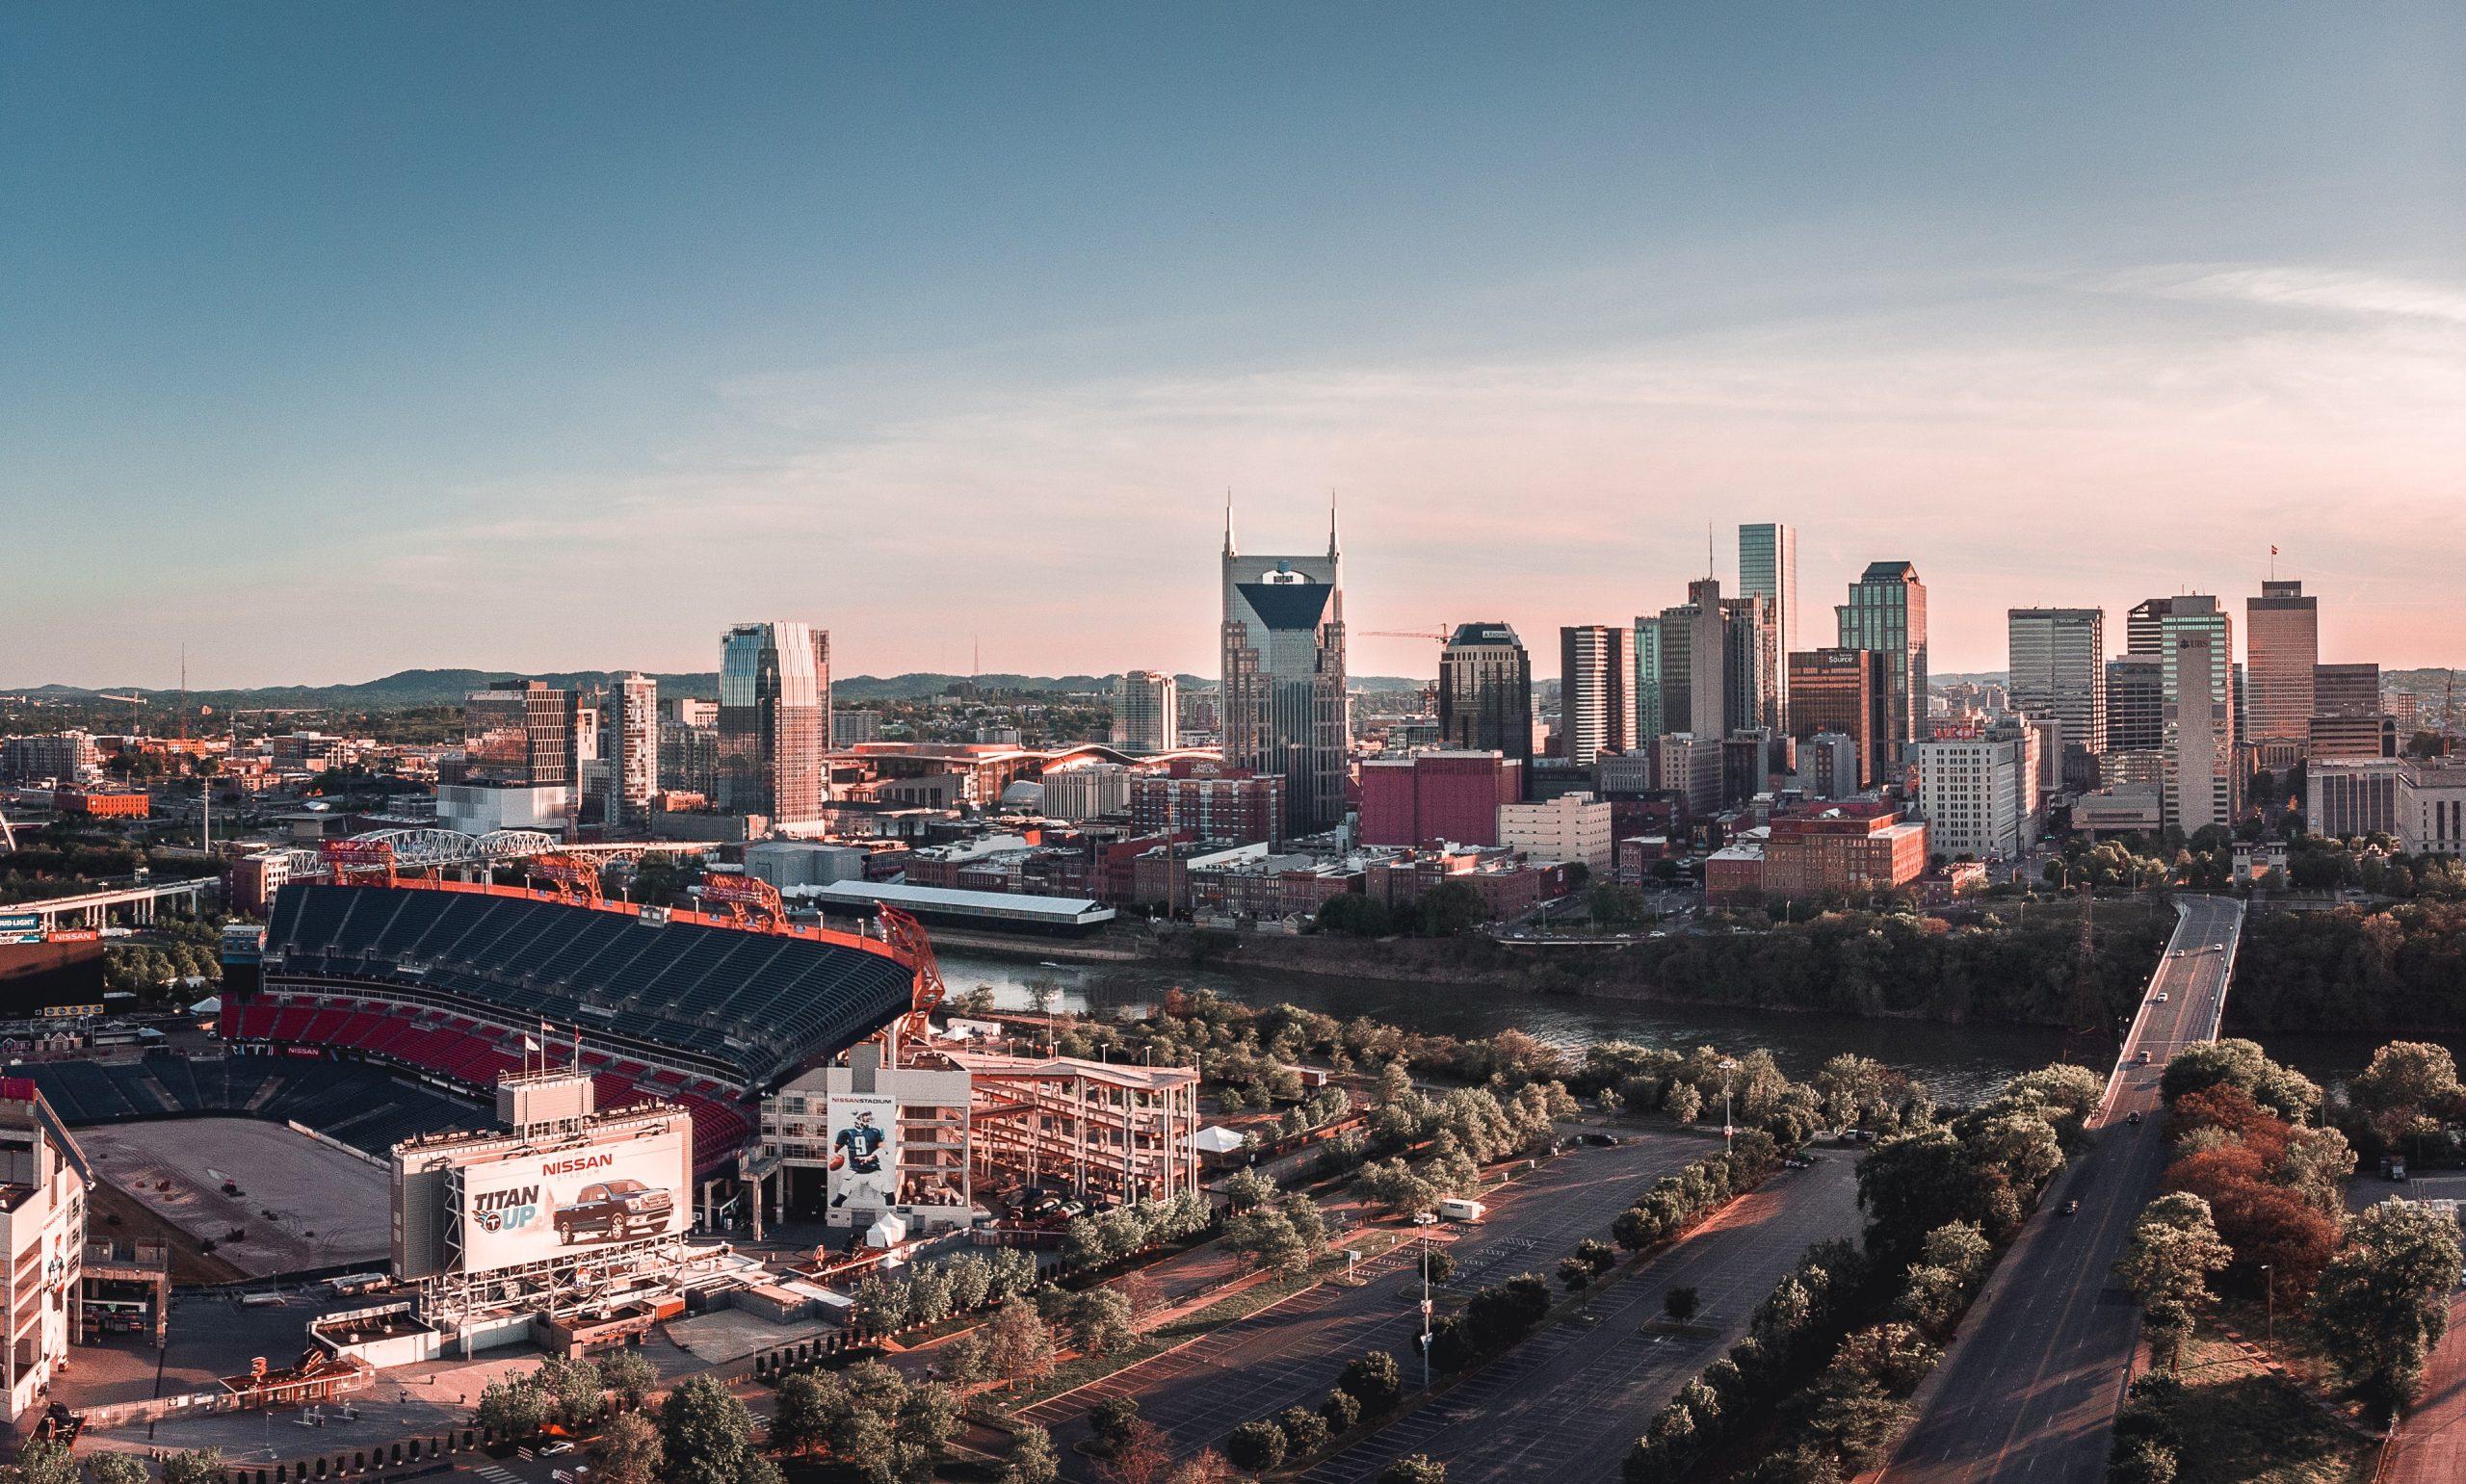 Nashville skyline in the evening.